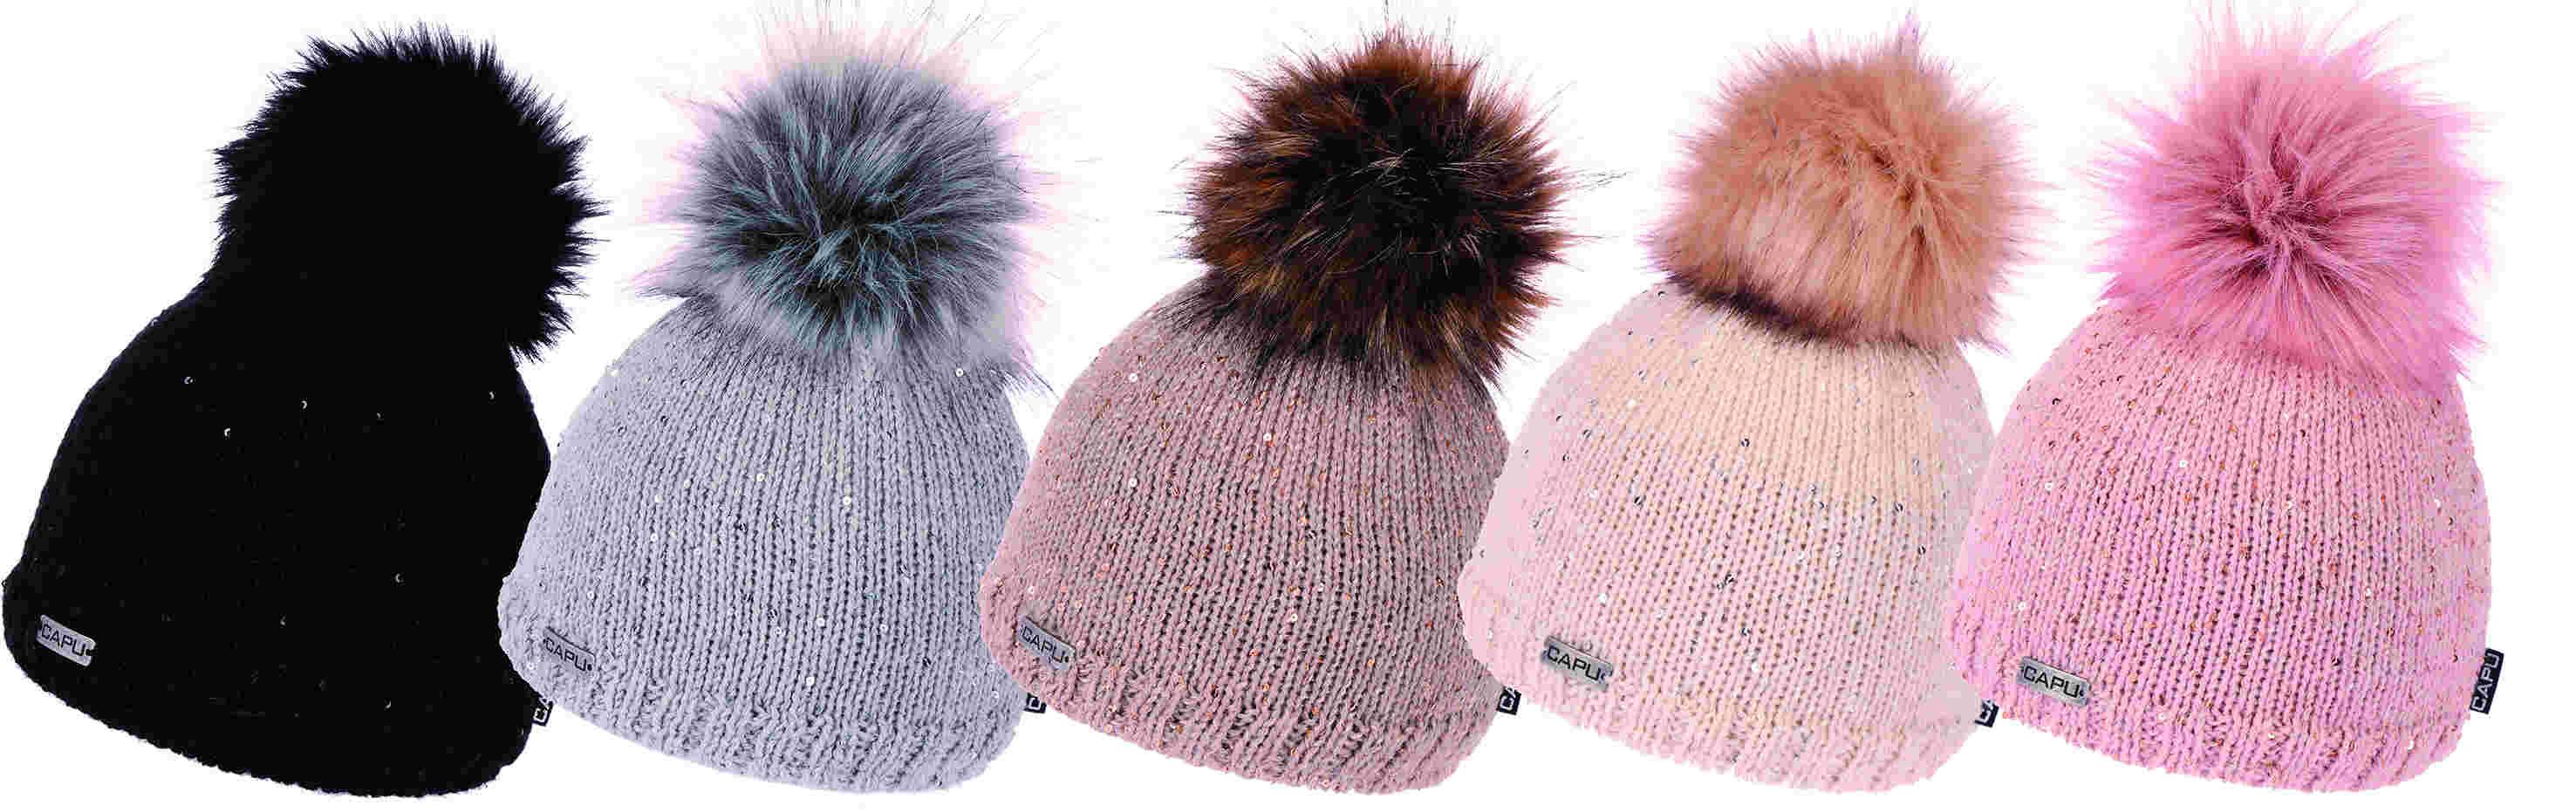 3dd626d90 Dámska móda | Zimná čiapka s brmbolcom CAPU 388 béžová | Mayoral ...